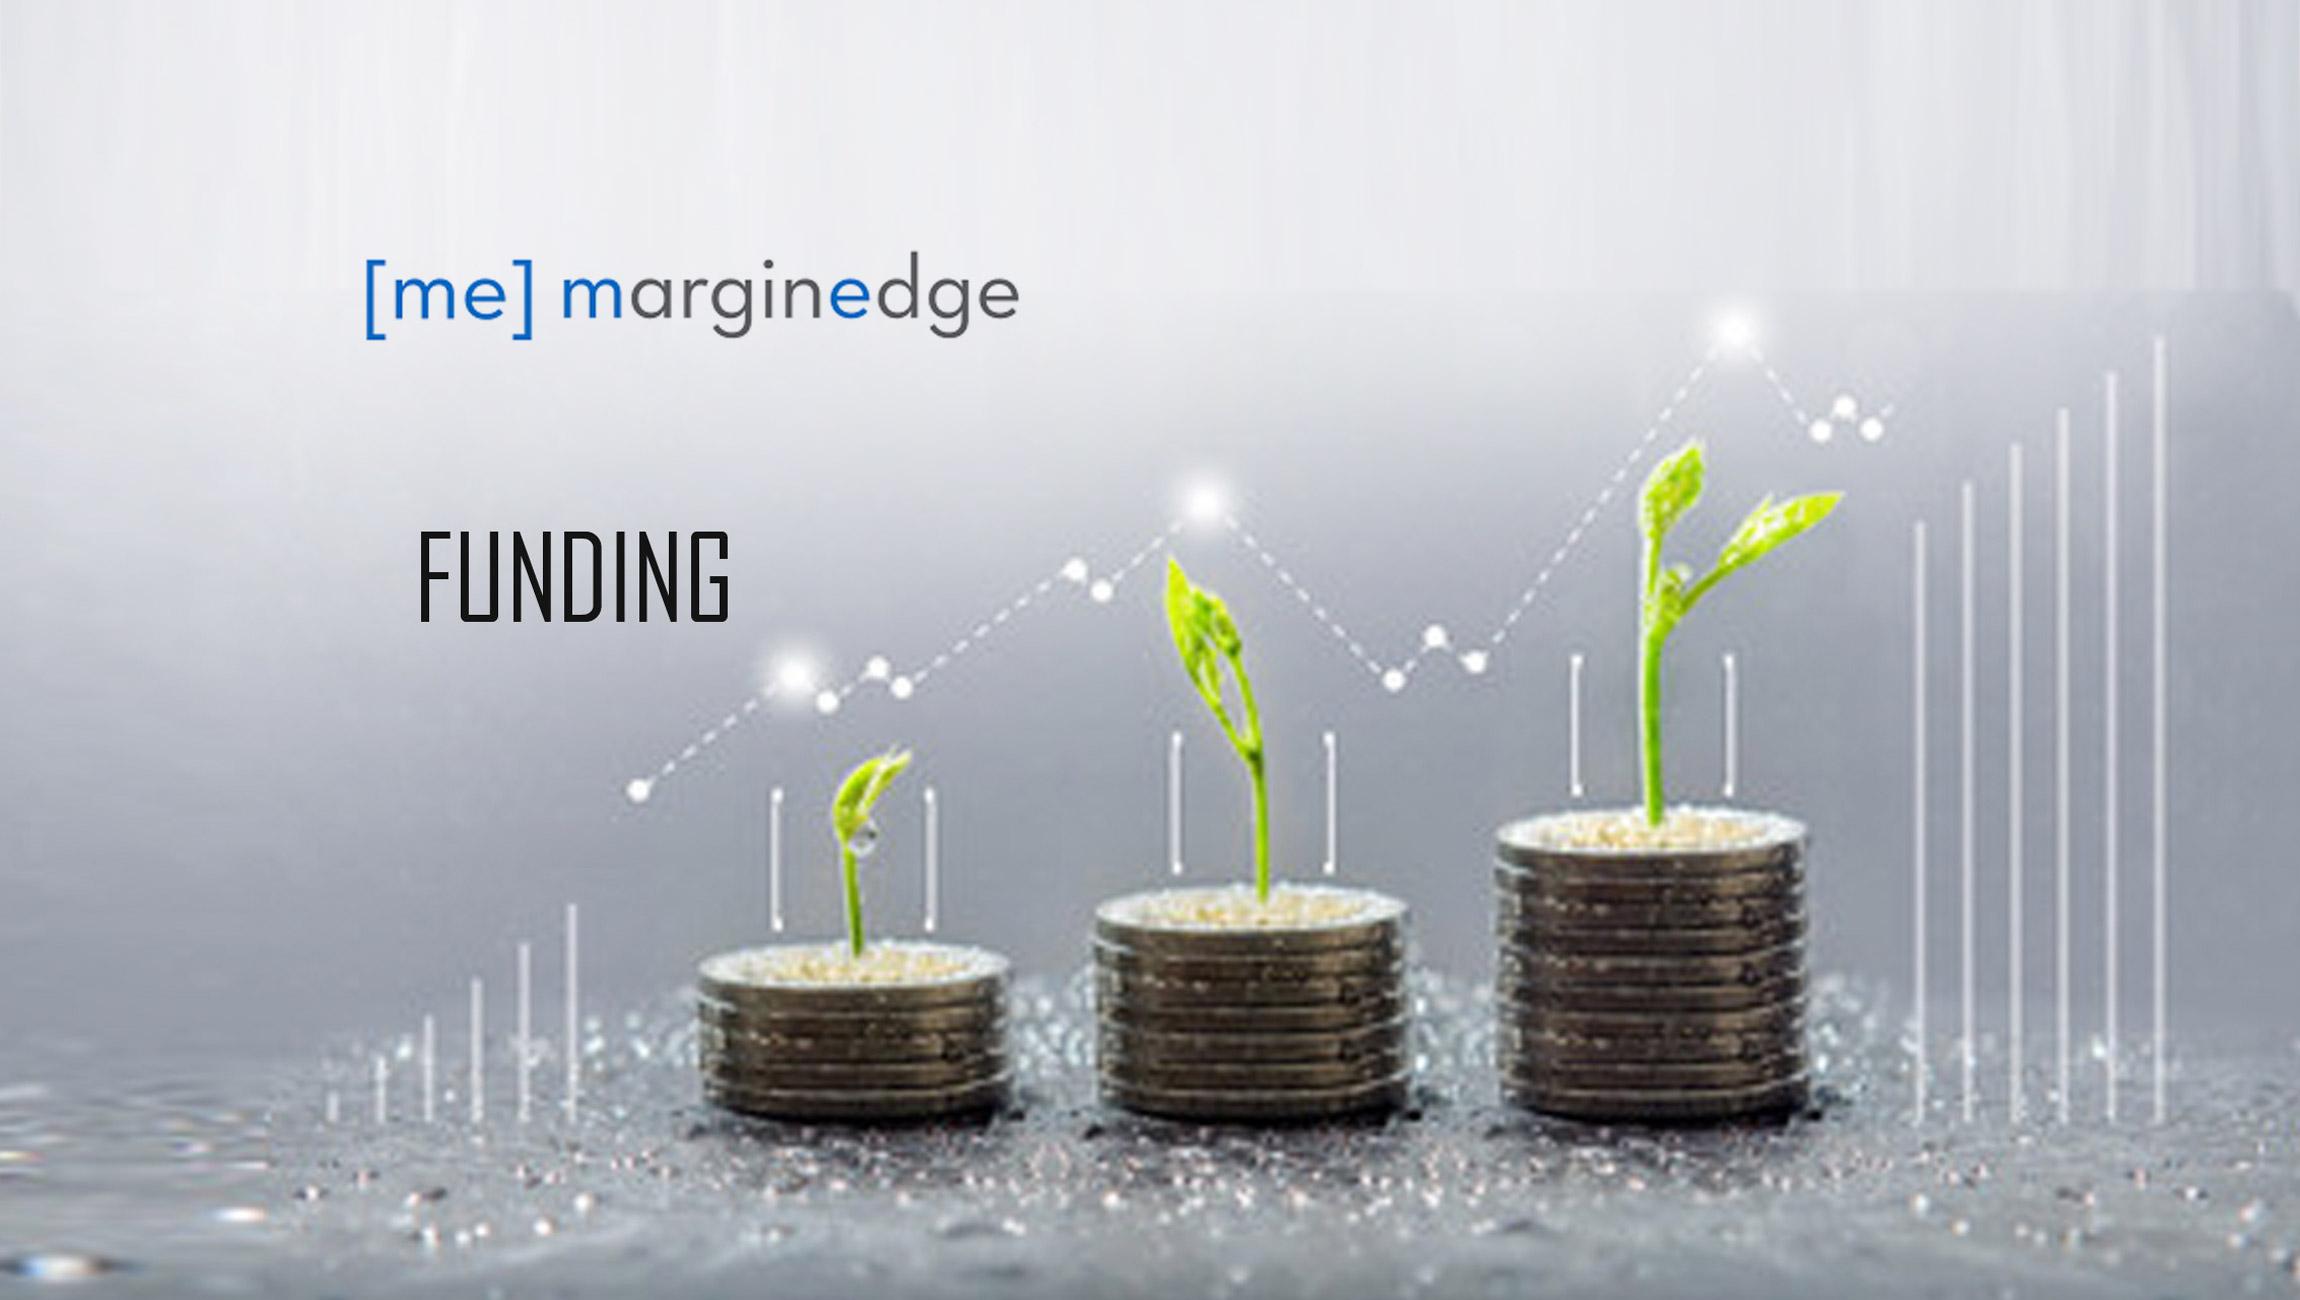 MarginEdge_-Leading-Restaurant-Management-Platform-Secures-_18-Million-in-Series-B-Funding